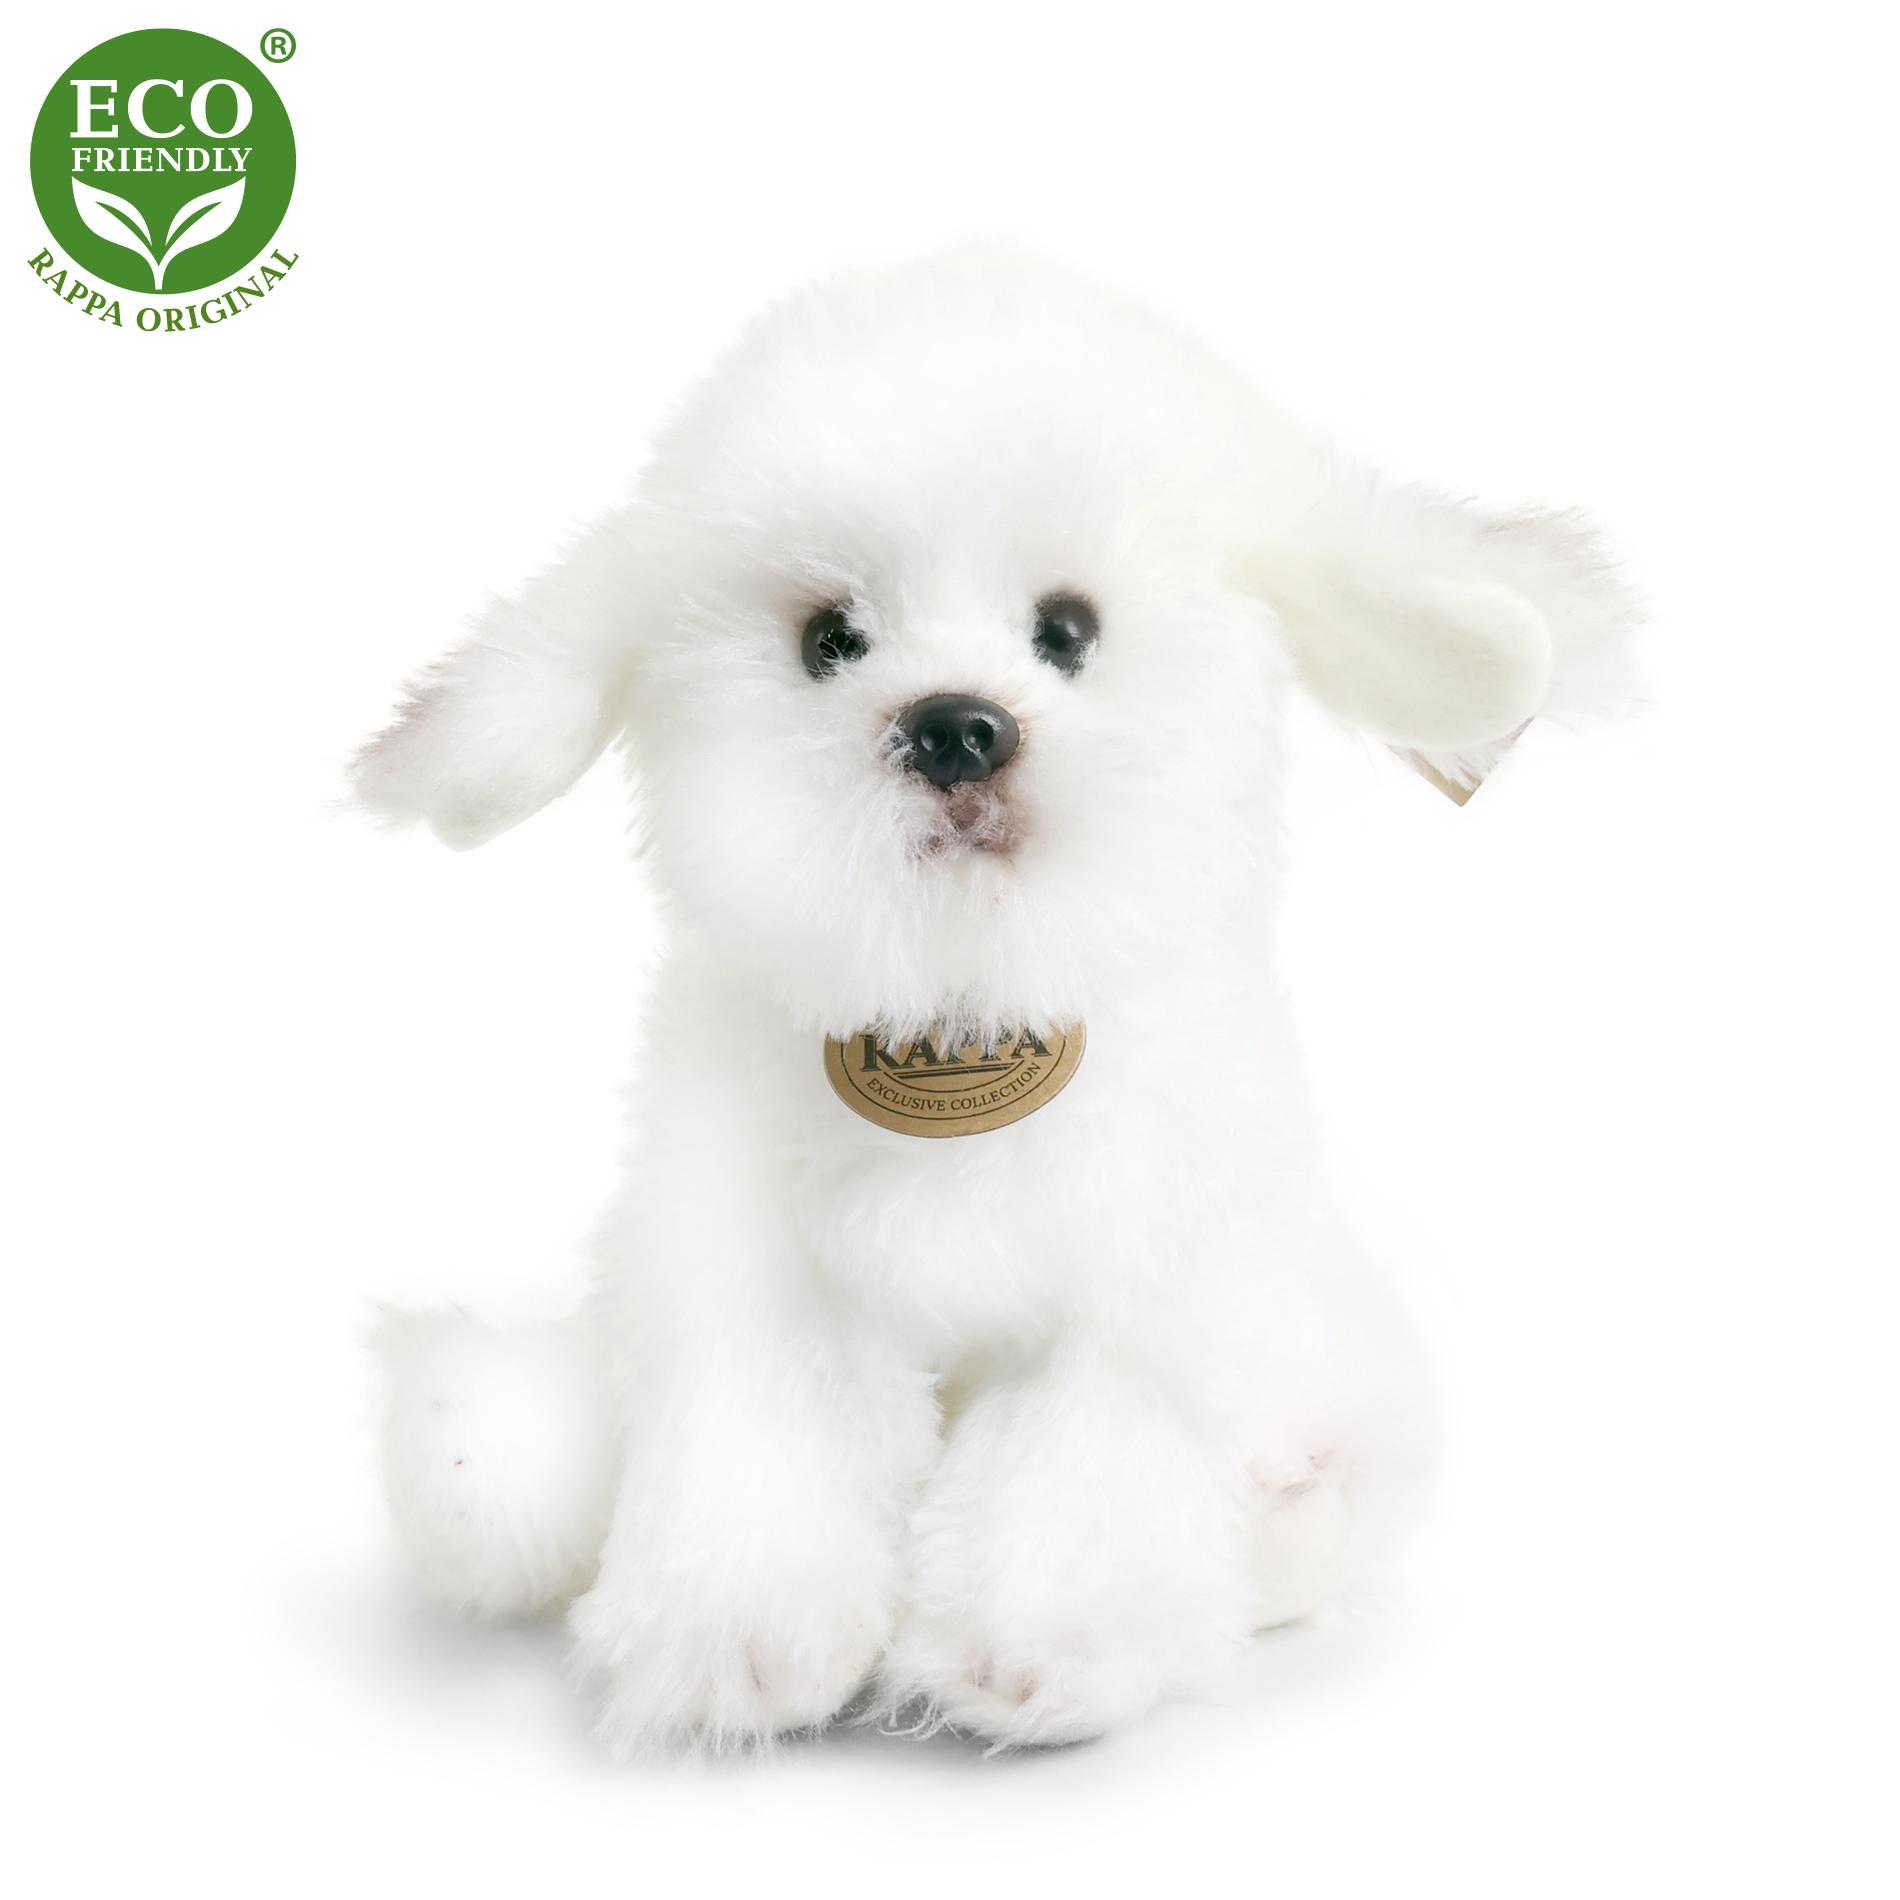 Plyšový pes bišonek sedící 26 cm ECO-FRIENDLY